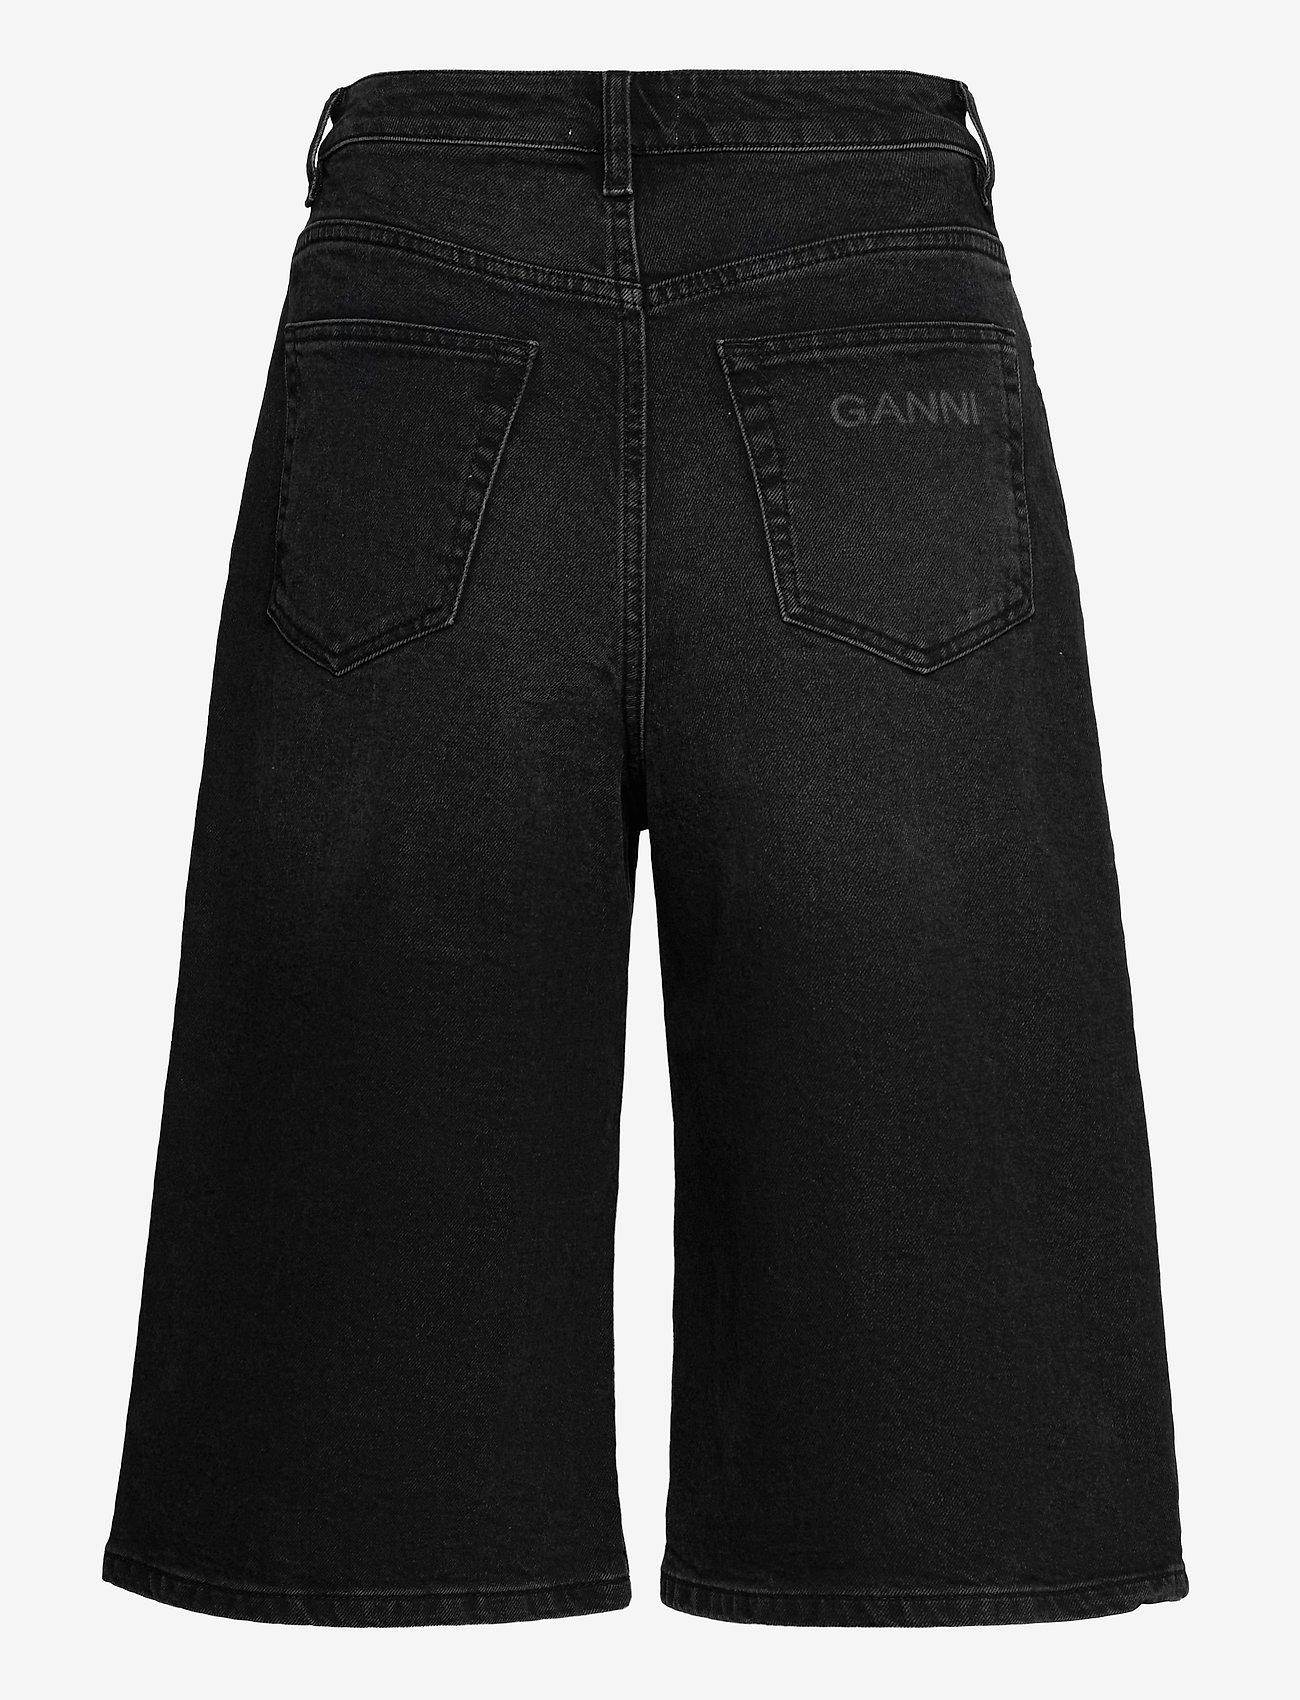 Ganni - Comfort Stretch - denimshorts - black - 1